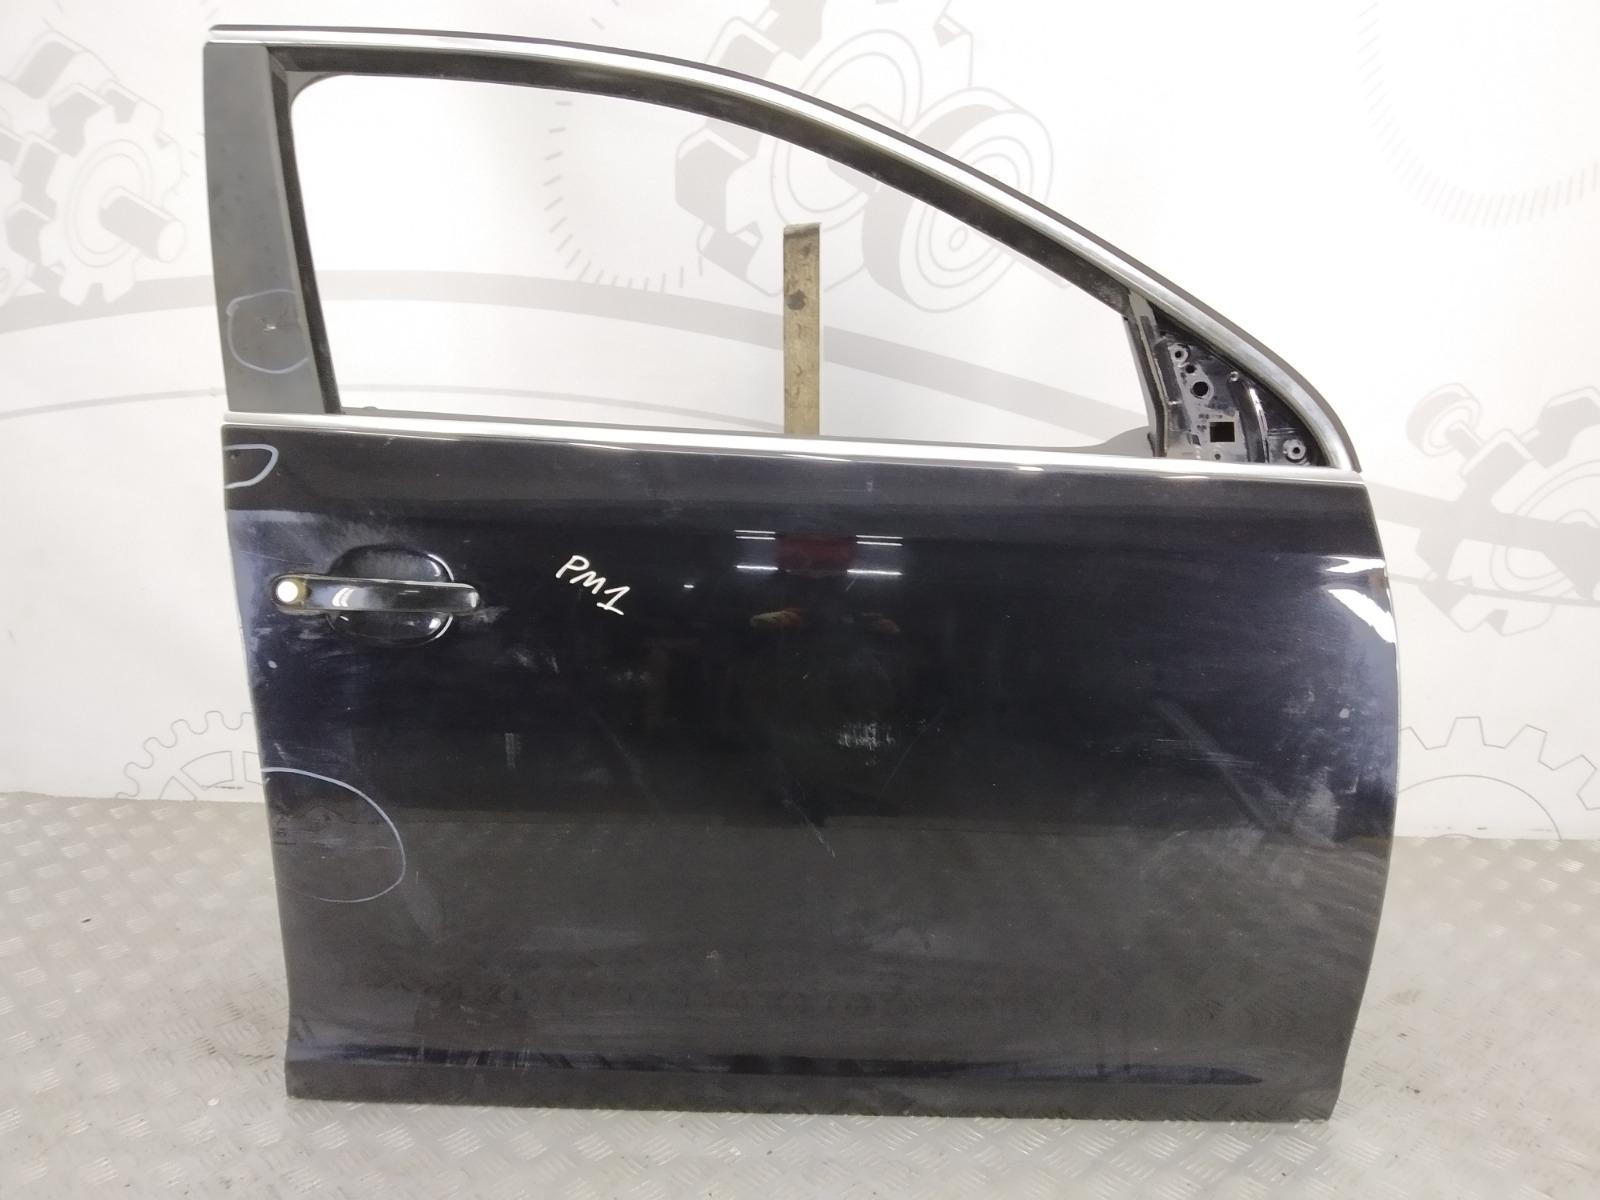 Дверь передняя правая Volkswagen Jetta 2.0 TDI 2008 (б/у)